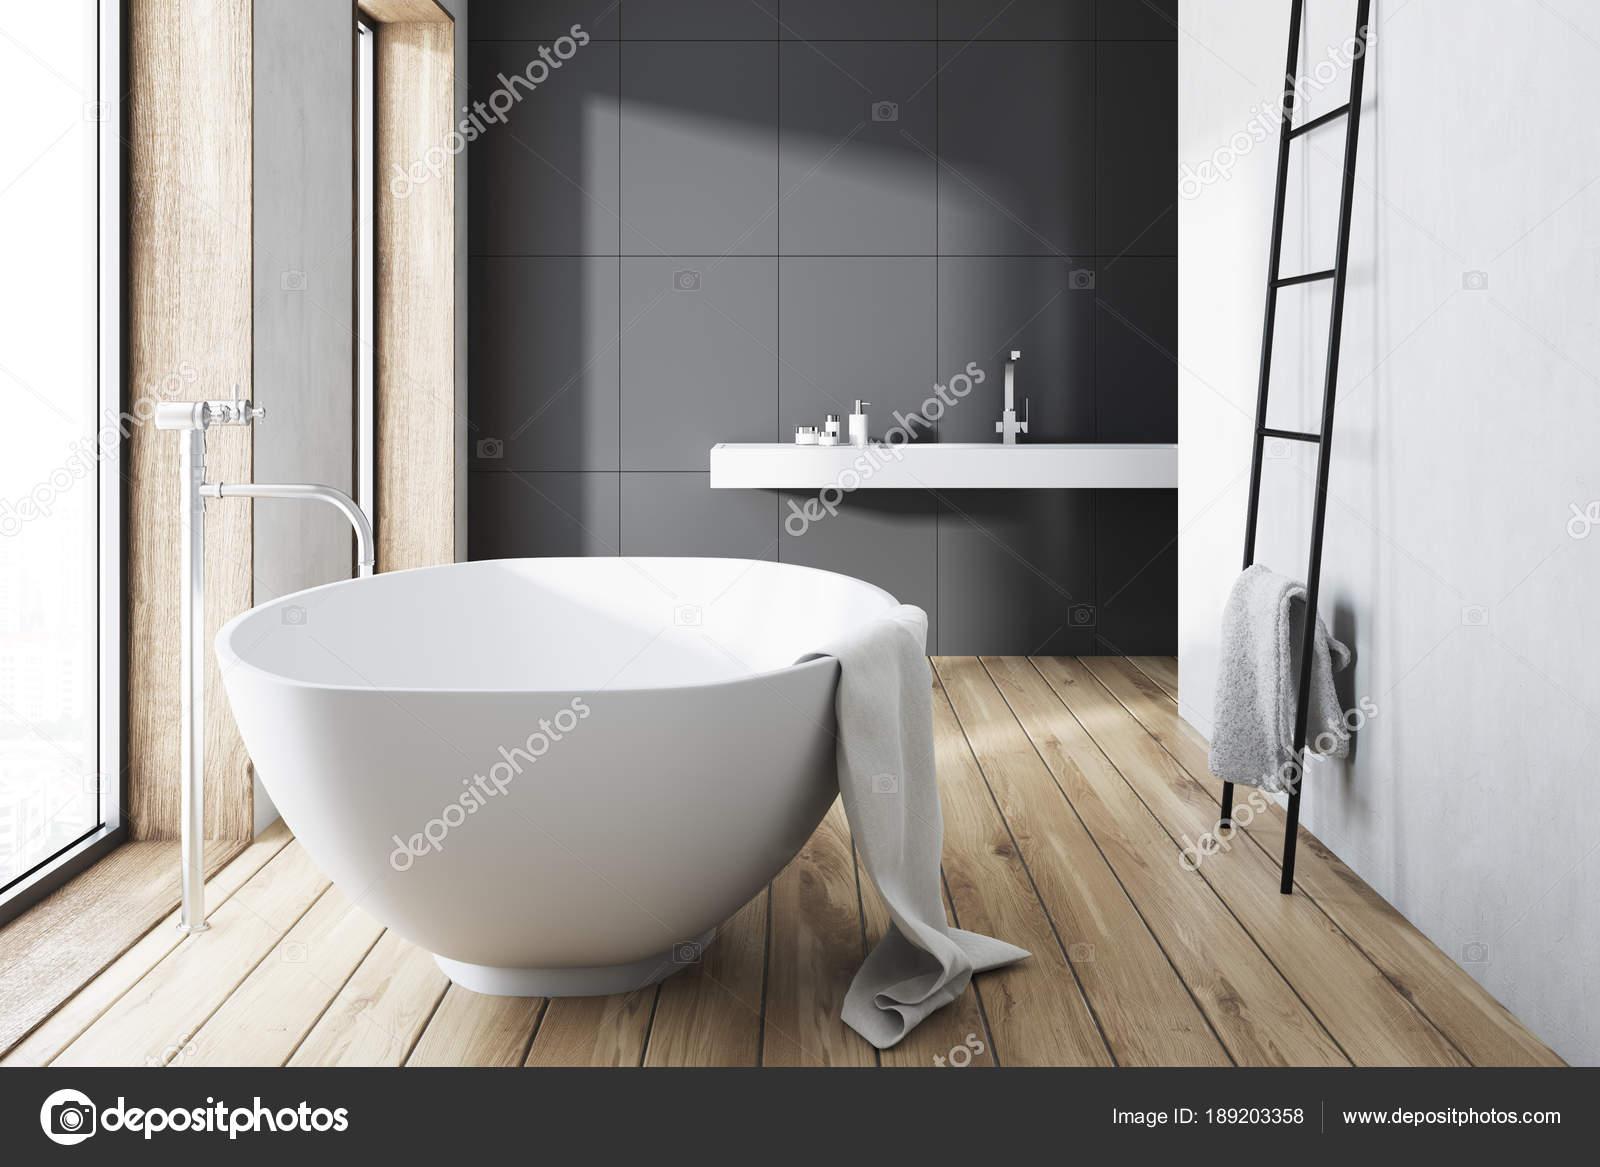 https://st3.depositphotos.com/2673929/18920/i/1600/depositphotos_189203358-stockafbeelding-grijs-wit-bad-badkamer-ladder.jpg